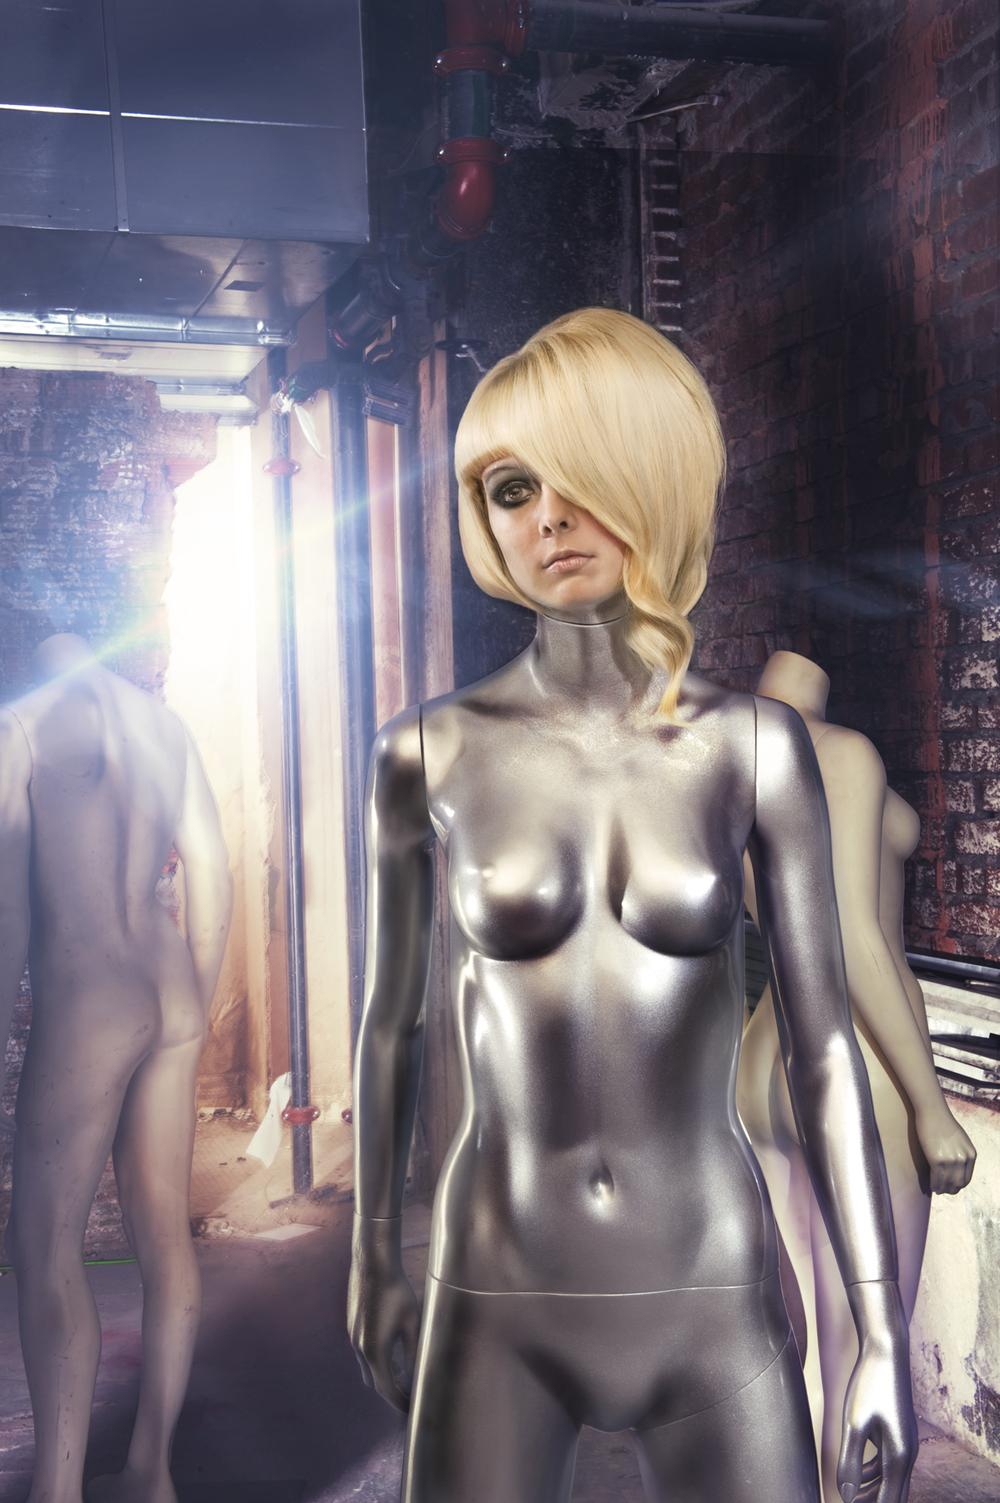 mannequin3-final011311 copy.jpg